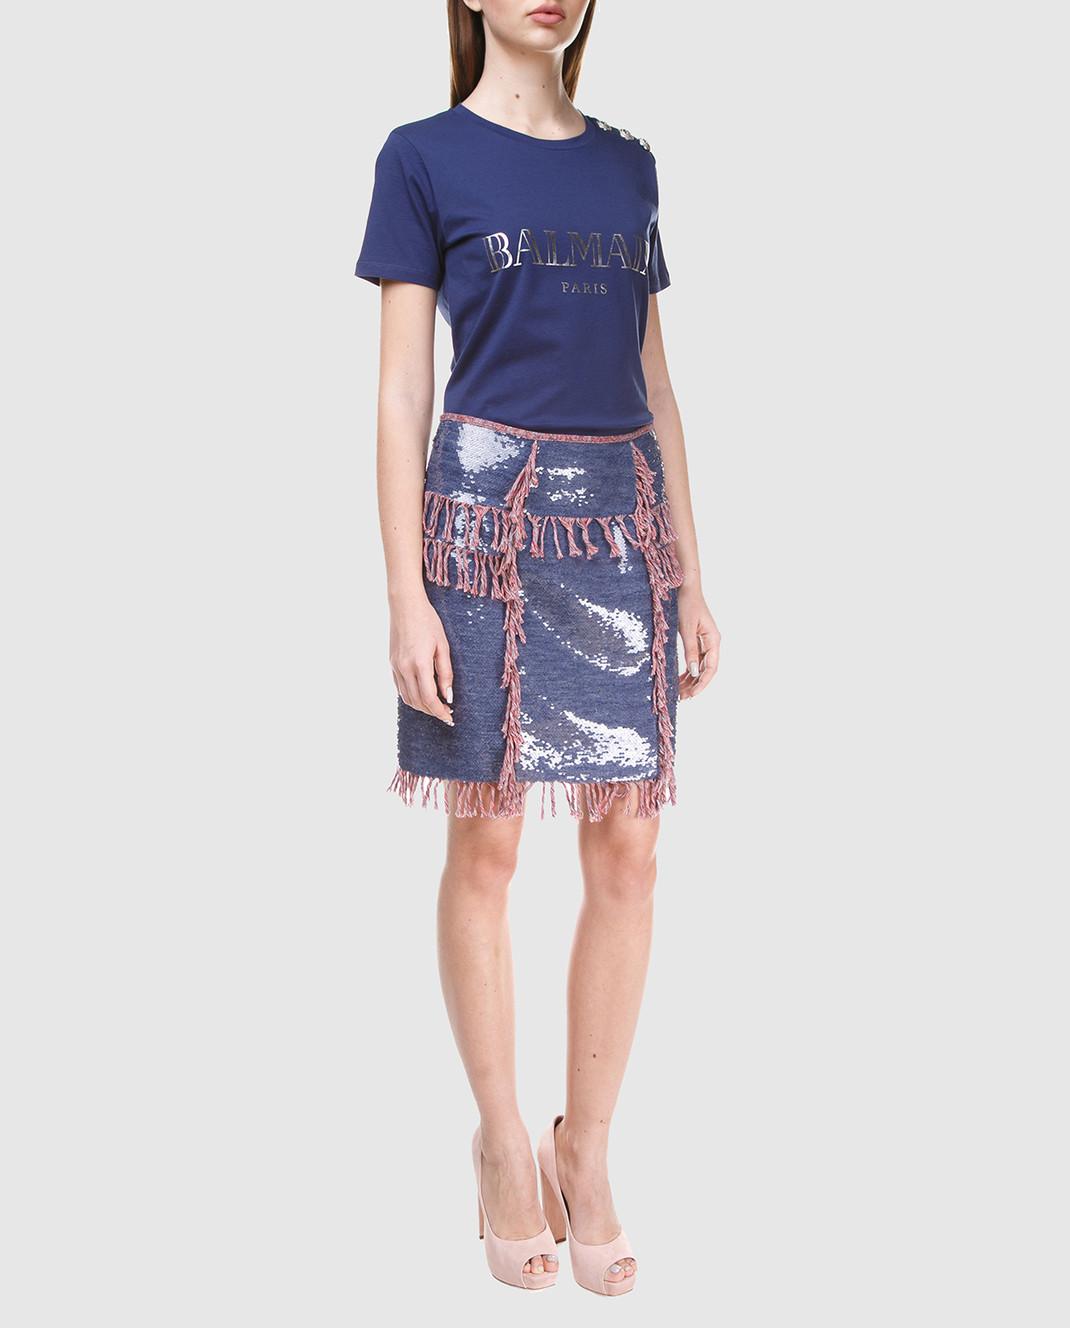 Balmain Синяя юбка с пайетками 124500 изображение 2